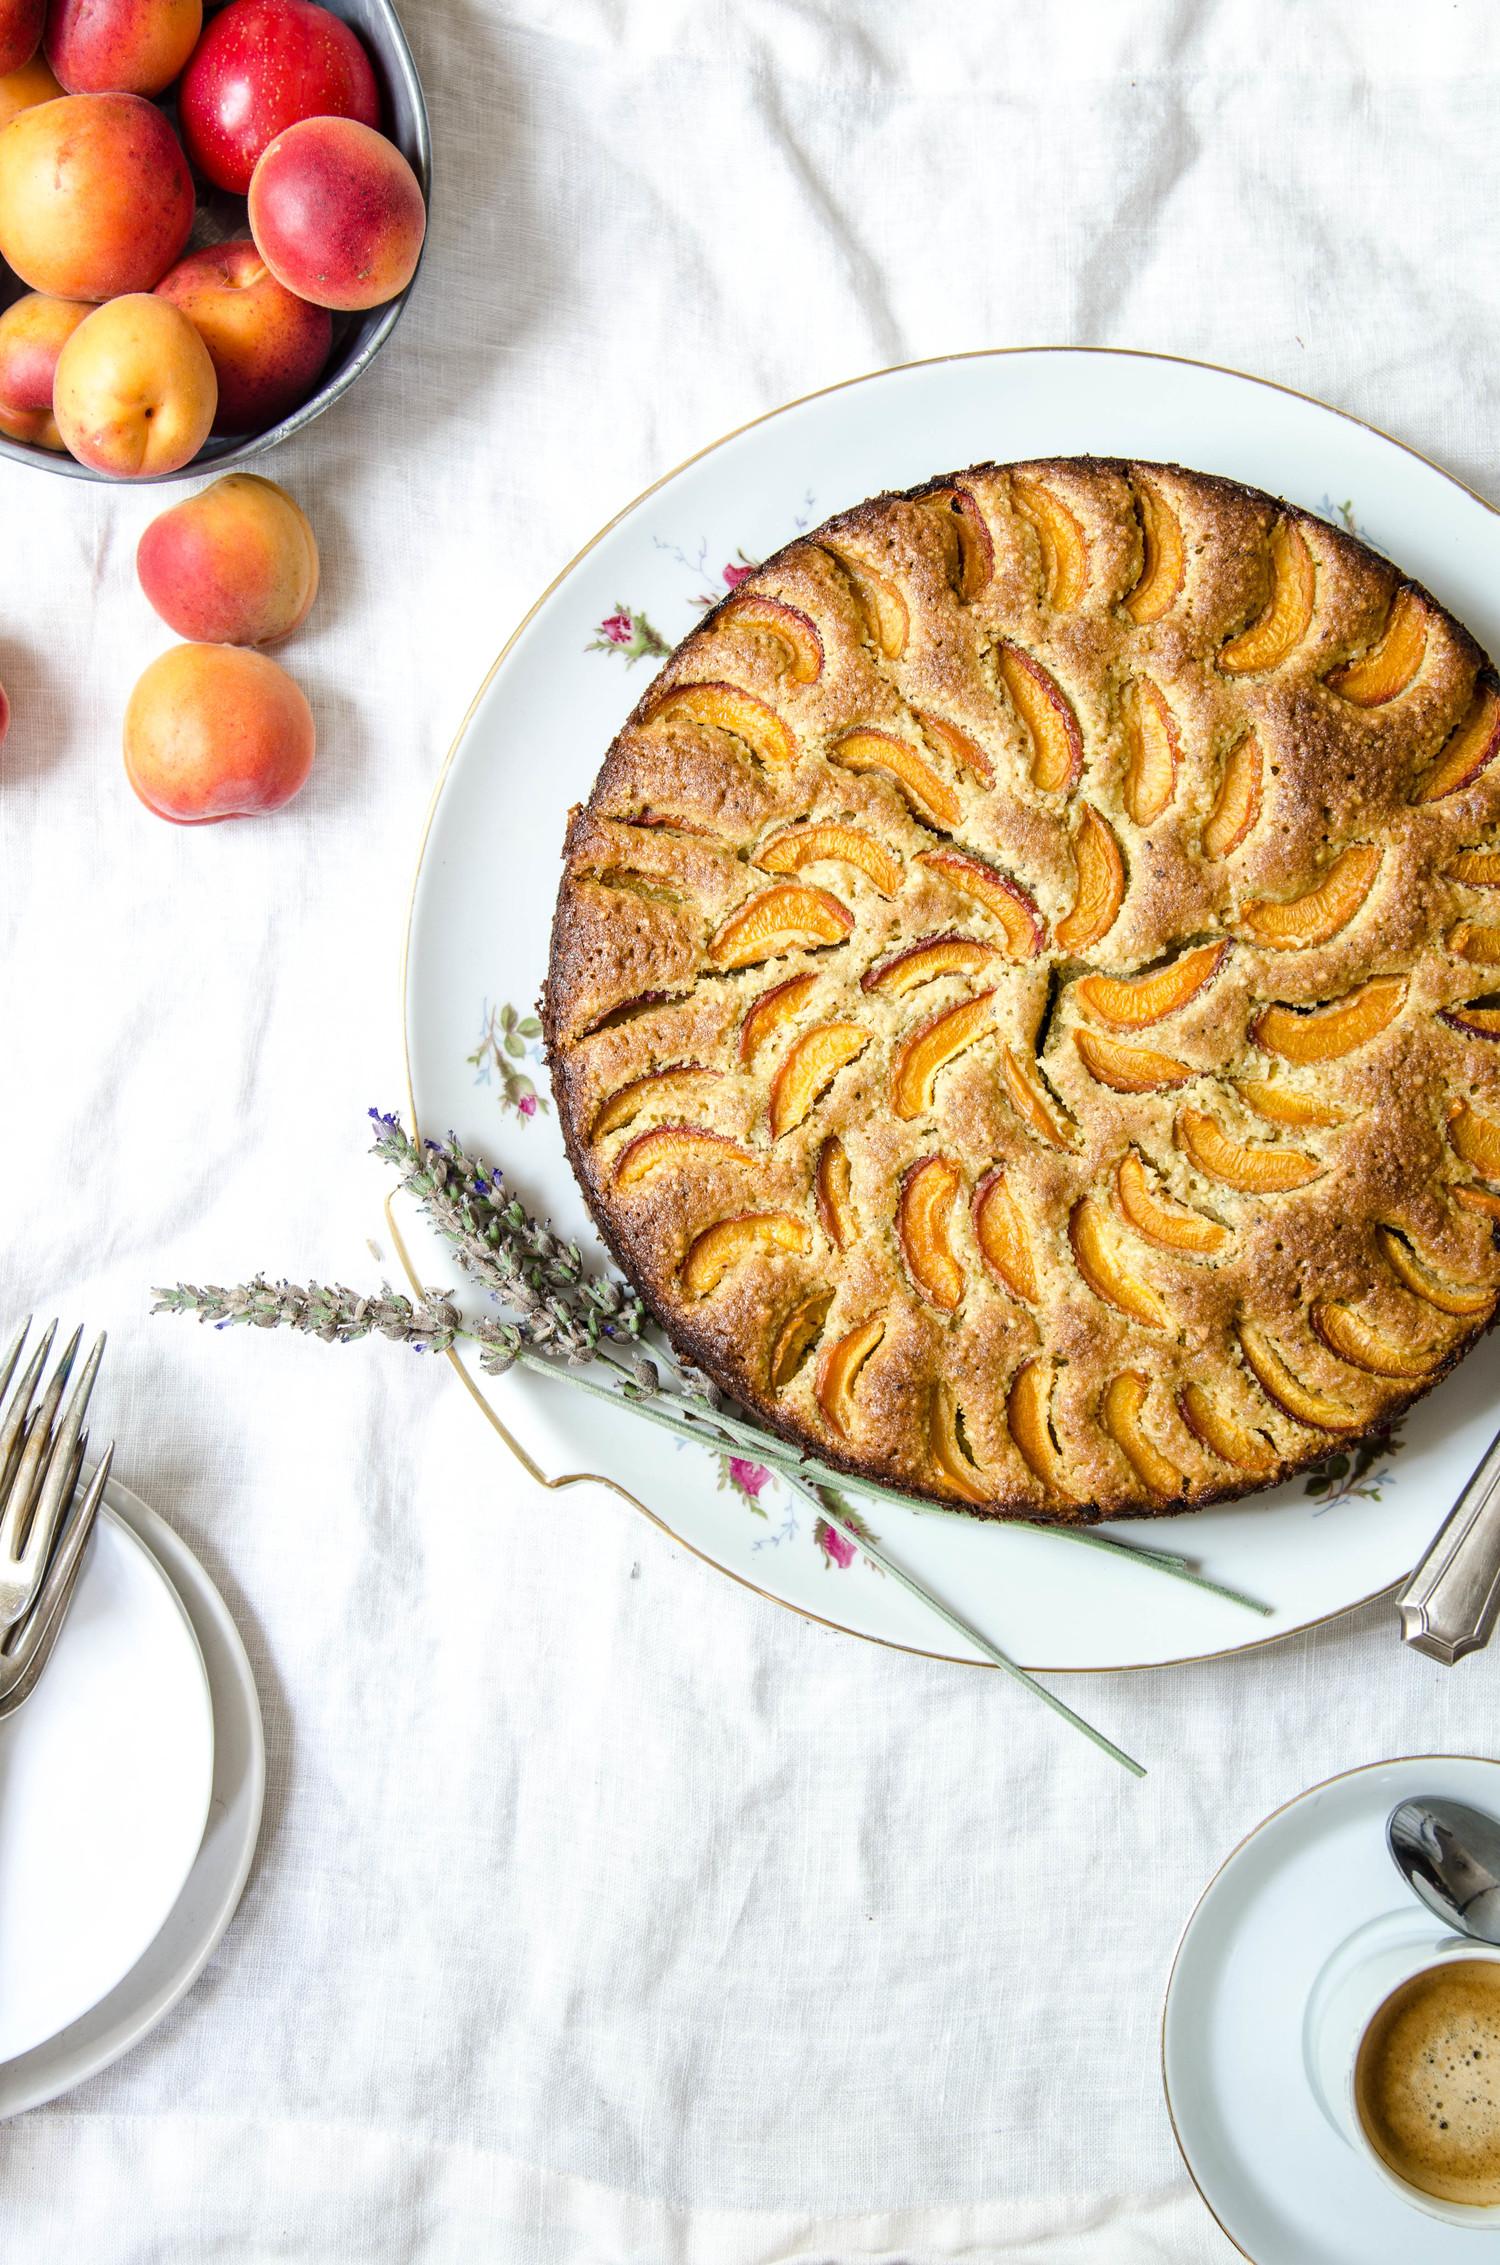 ROSE+&+IVY+Journal+Almond+Apricot+Pistachio+Cake.jpeg